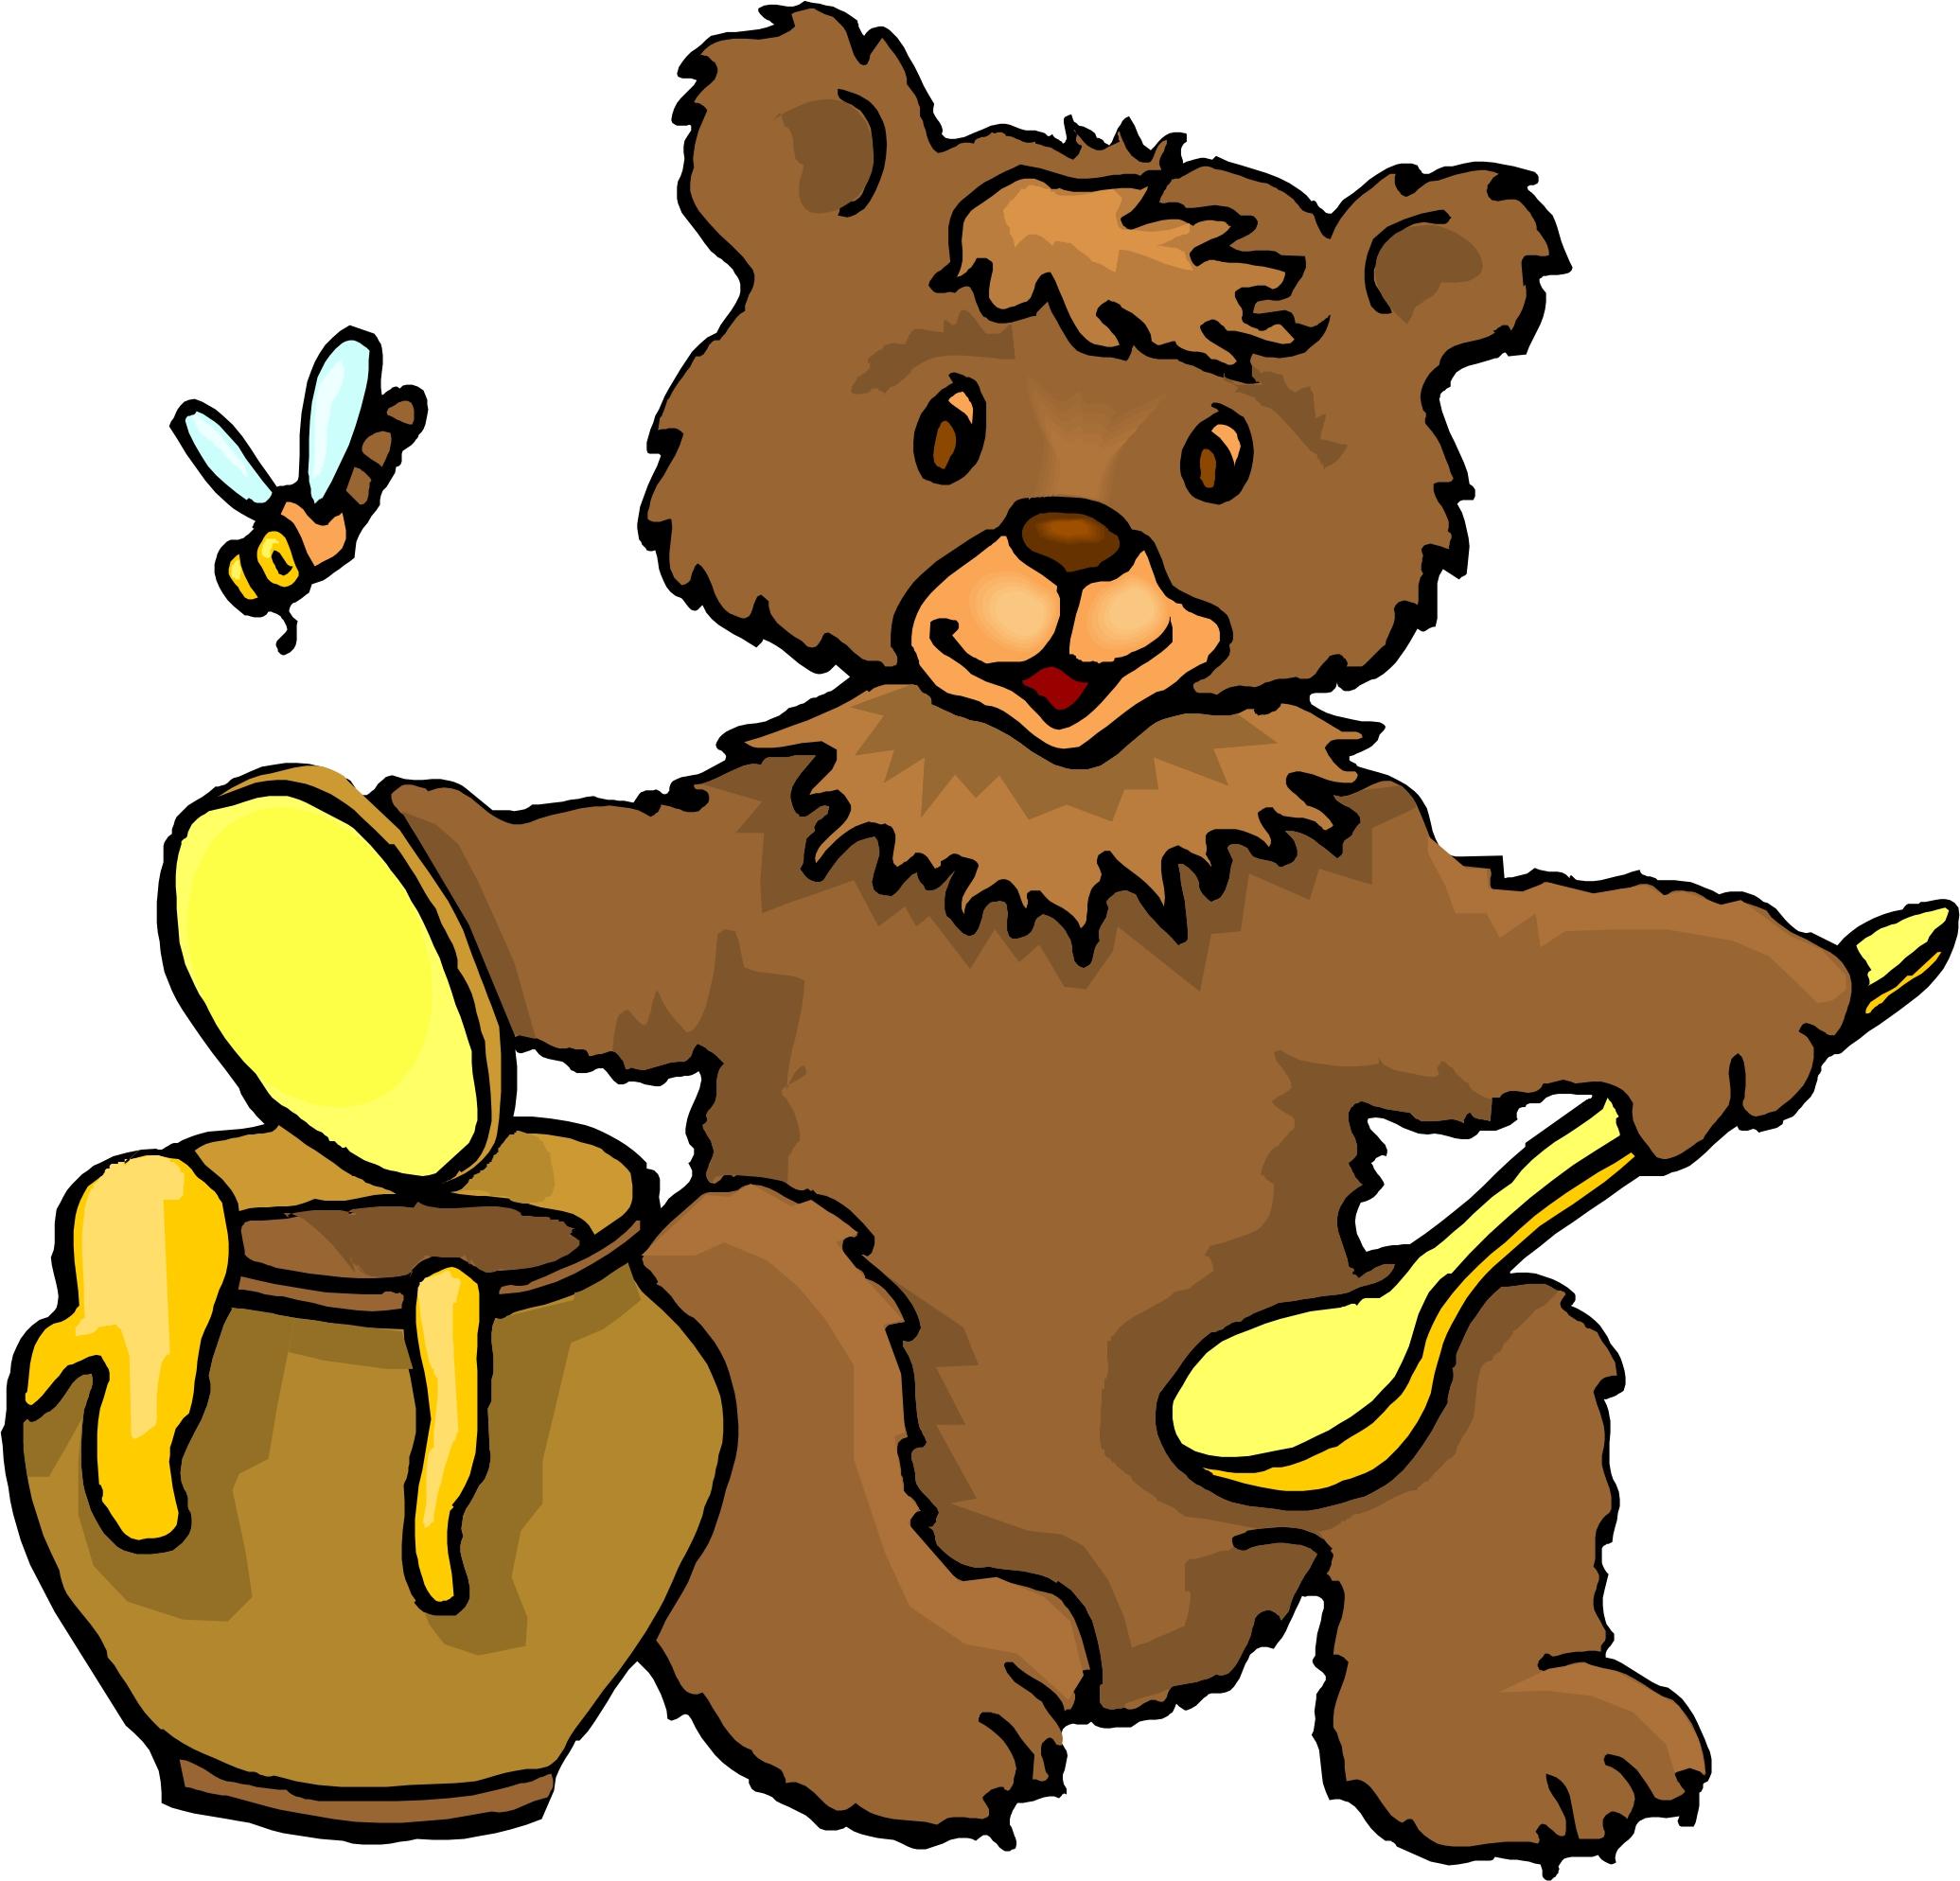 Brown Bear clipart 3 bears Jar Art Clipart The Cliparts